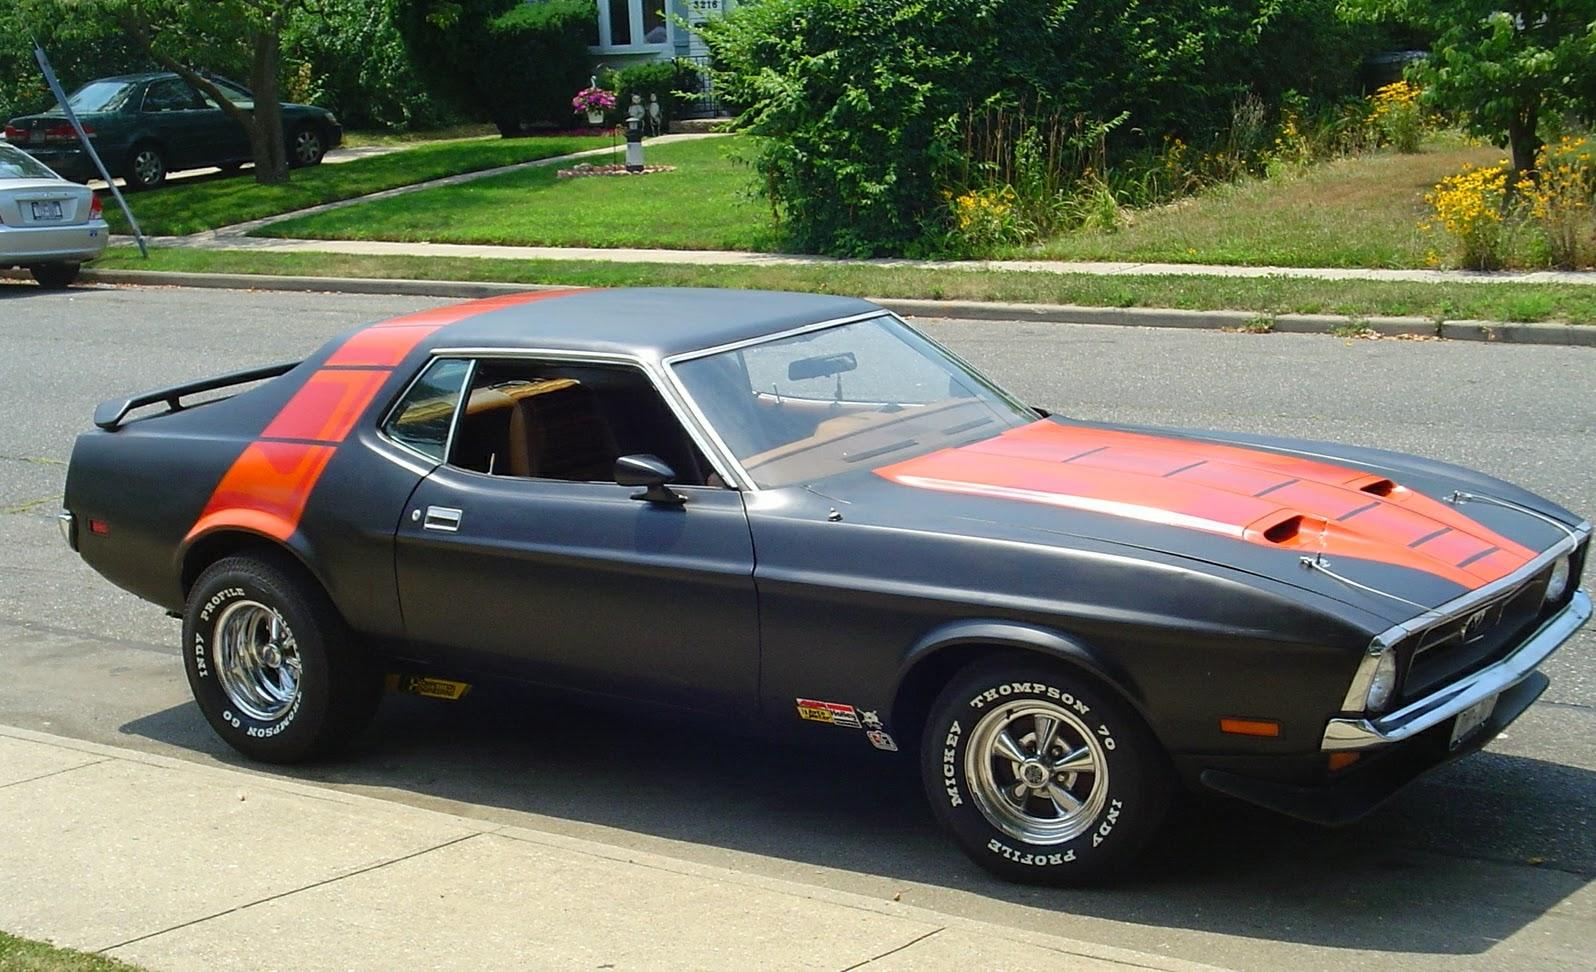 Mustang Clasico Carros Usa